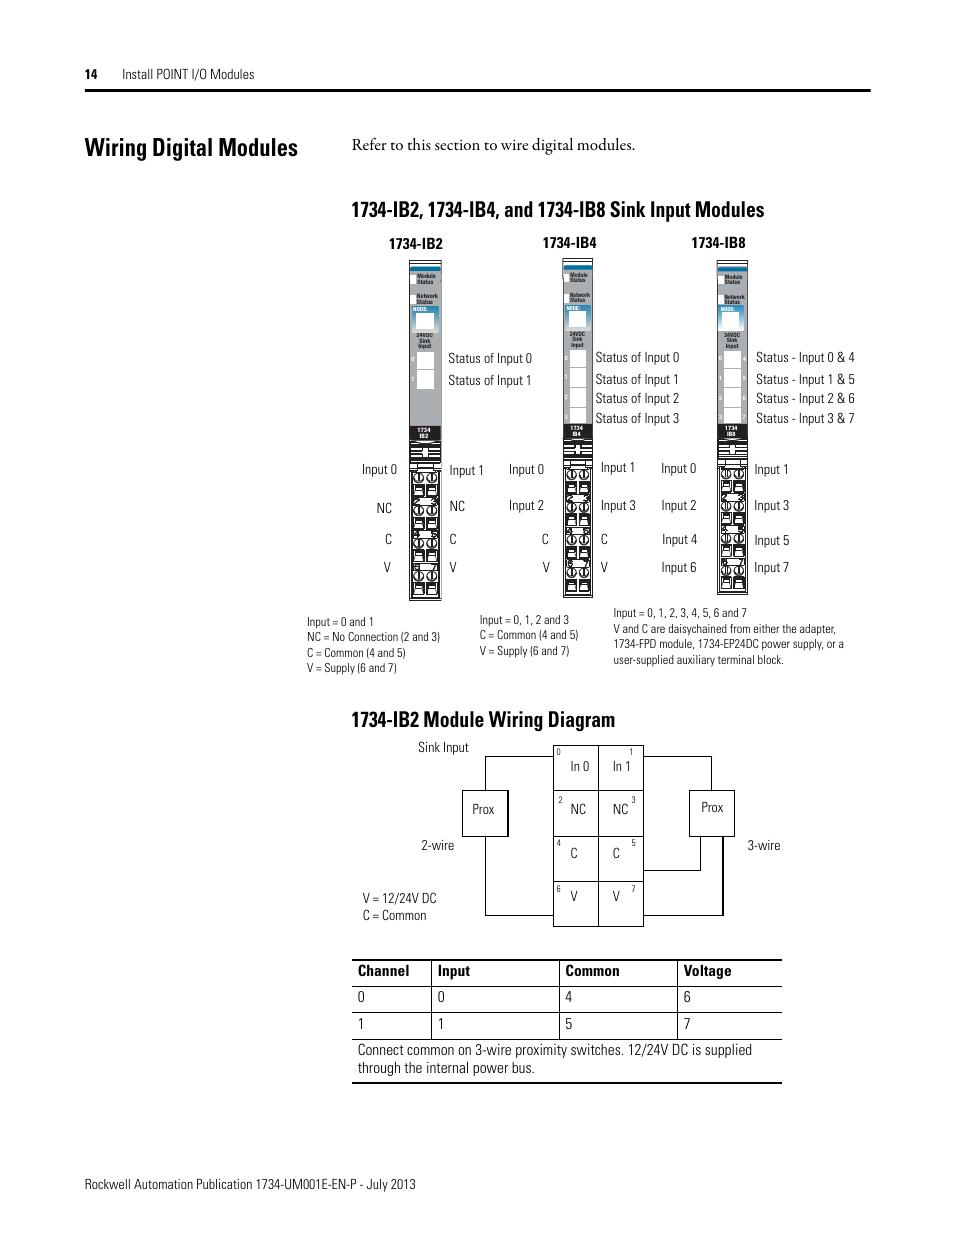 Wiring Digital Modules